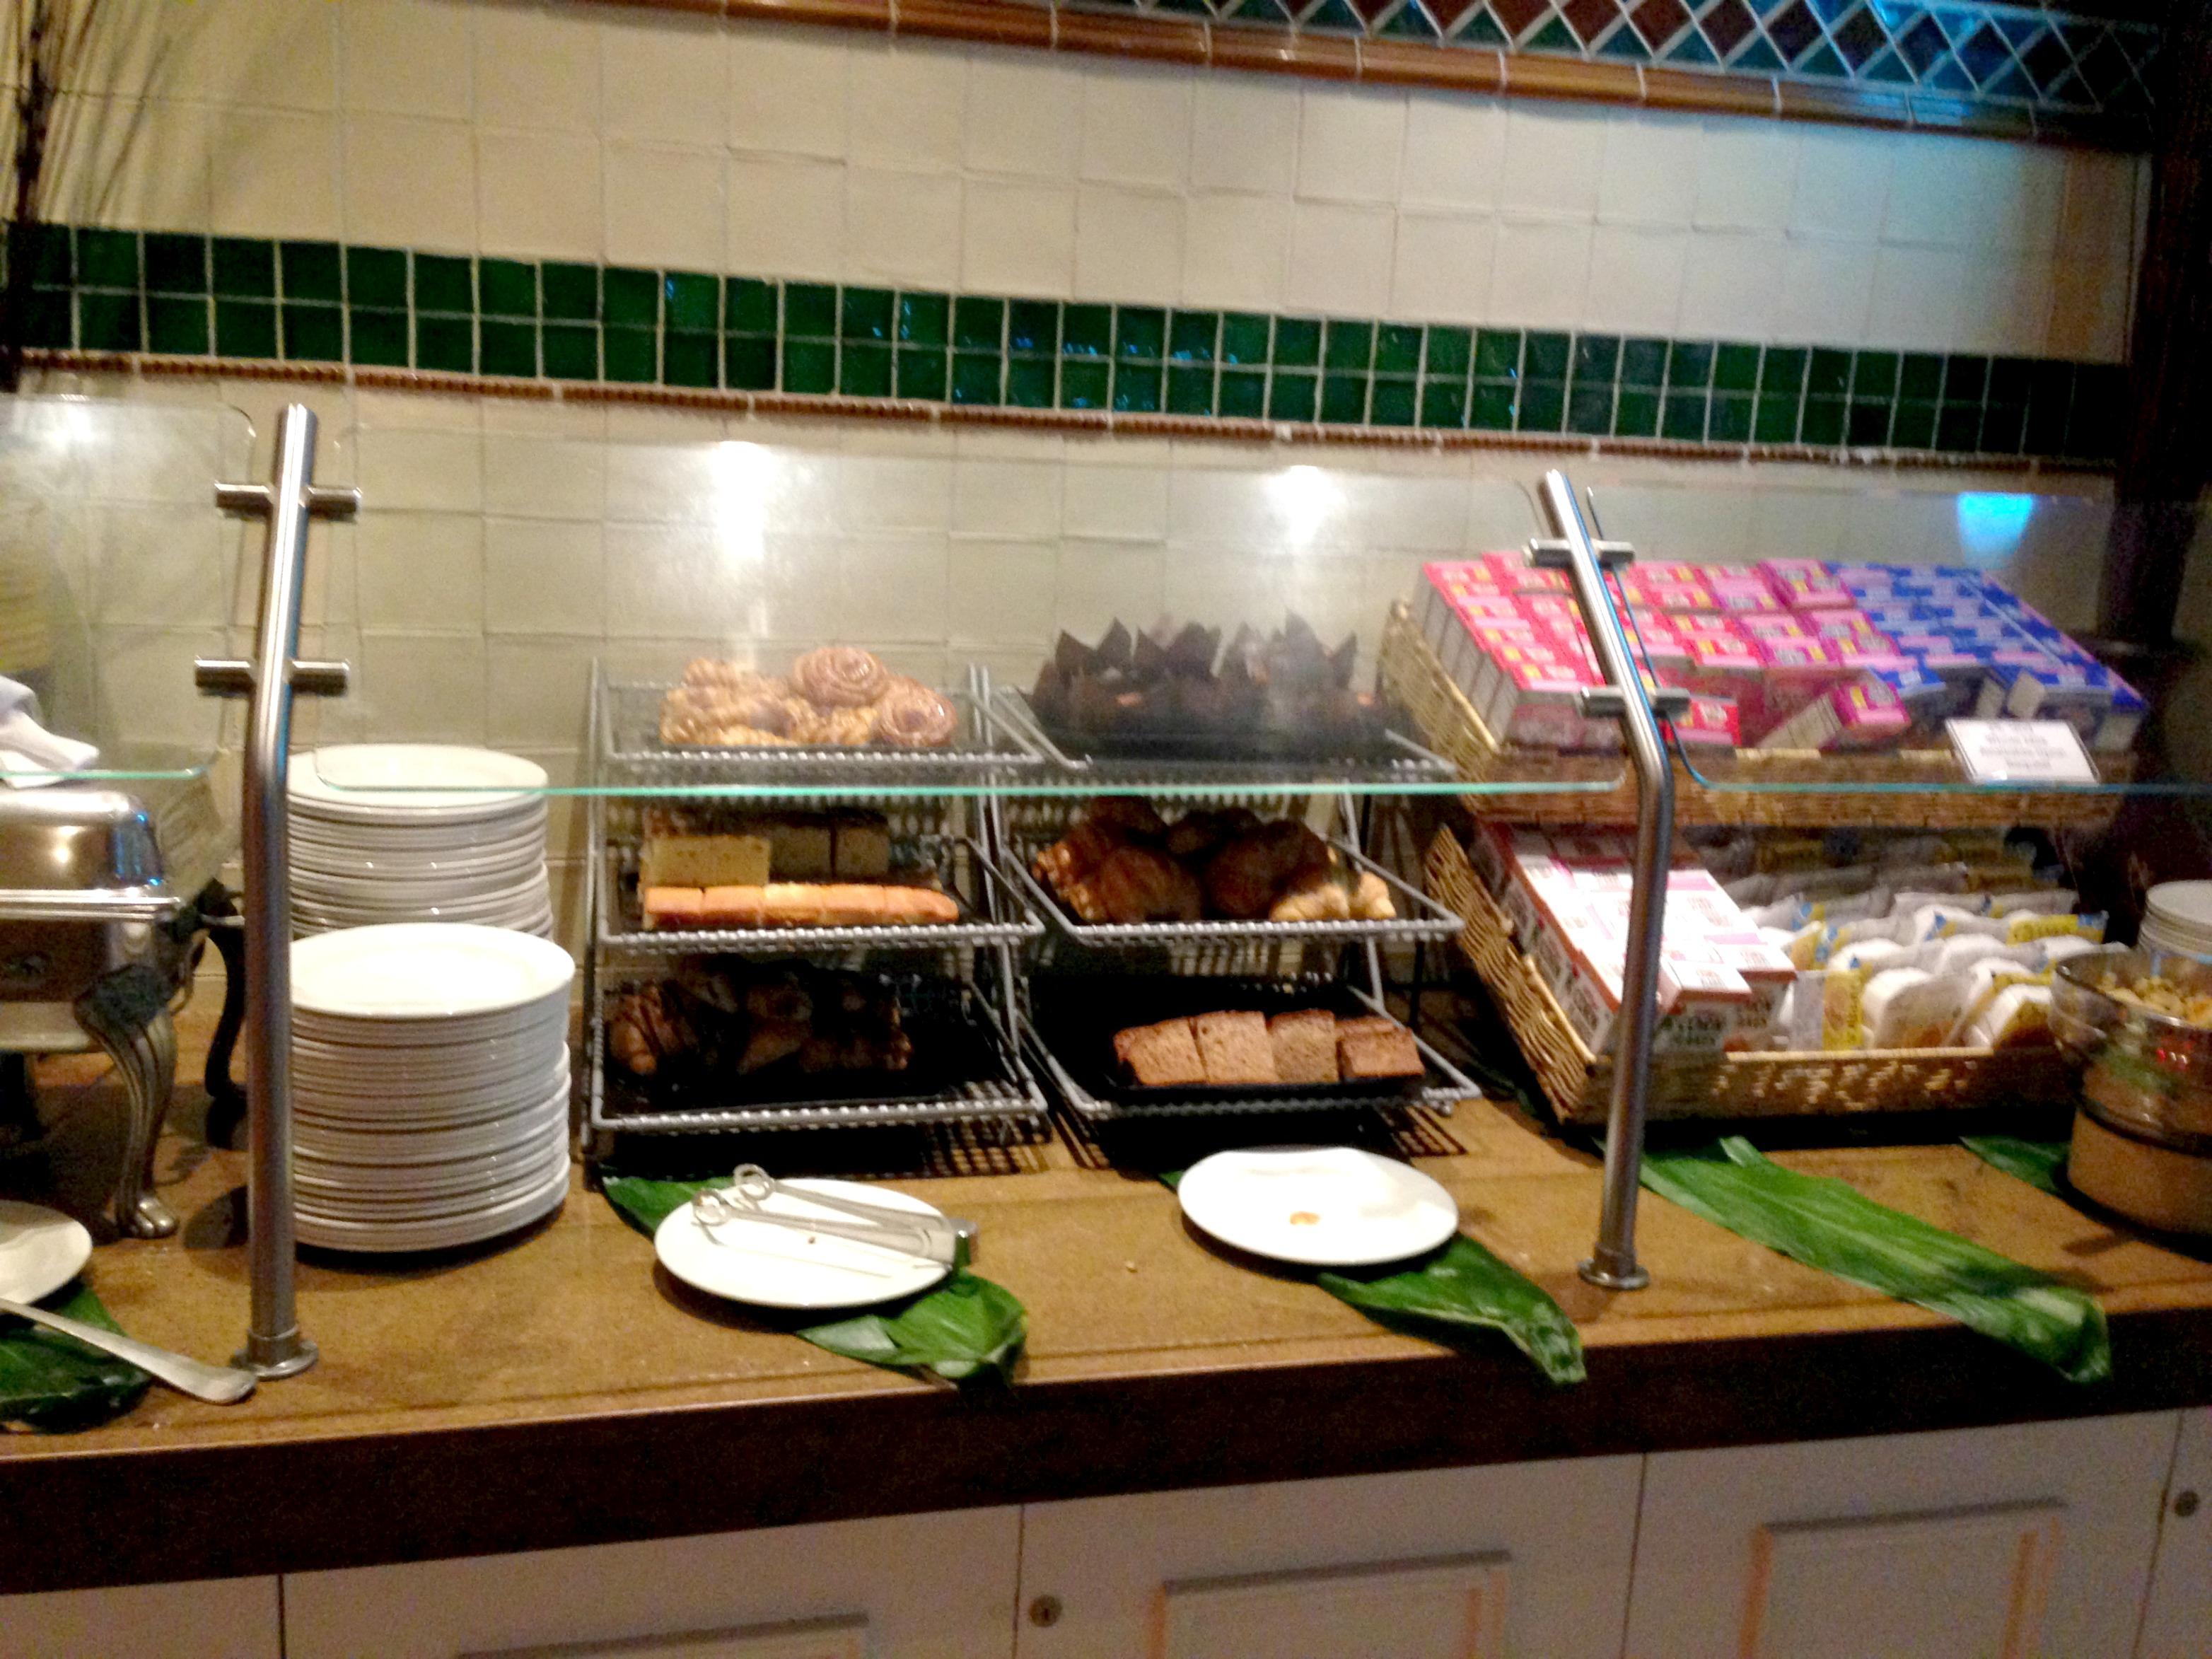 Breakfast at the Sheraton Maui cold buffet